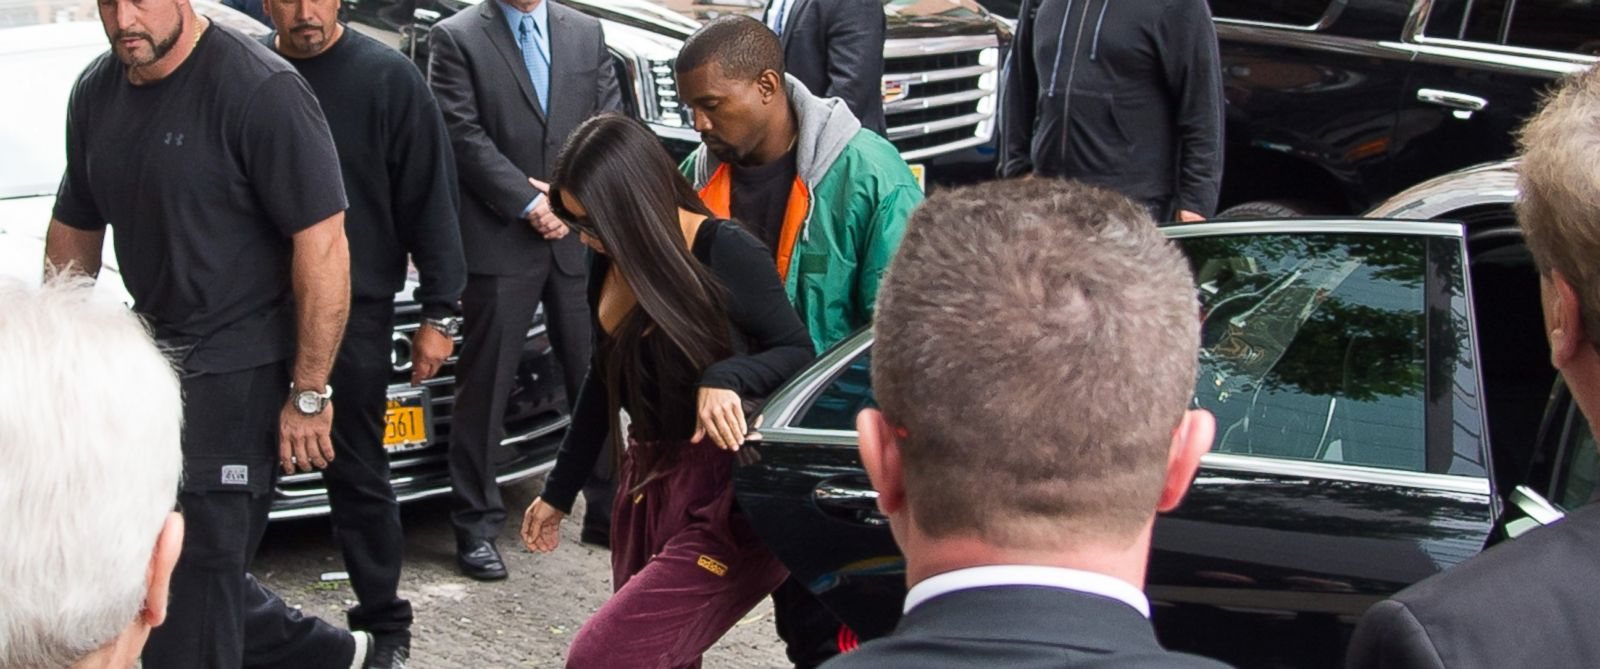 kim kardashian überfall paris